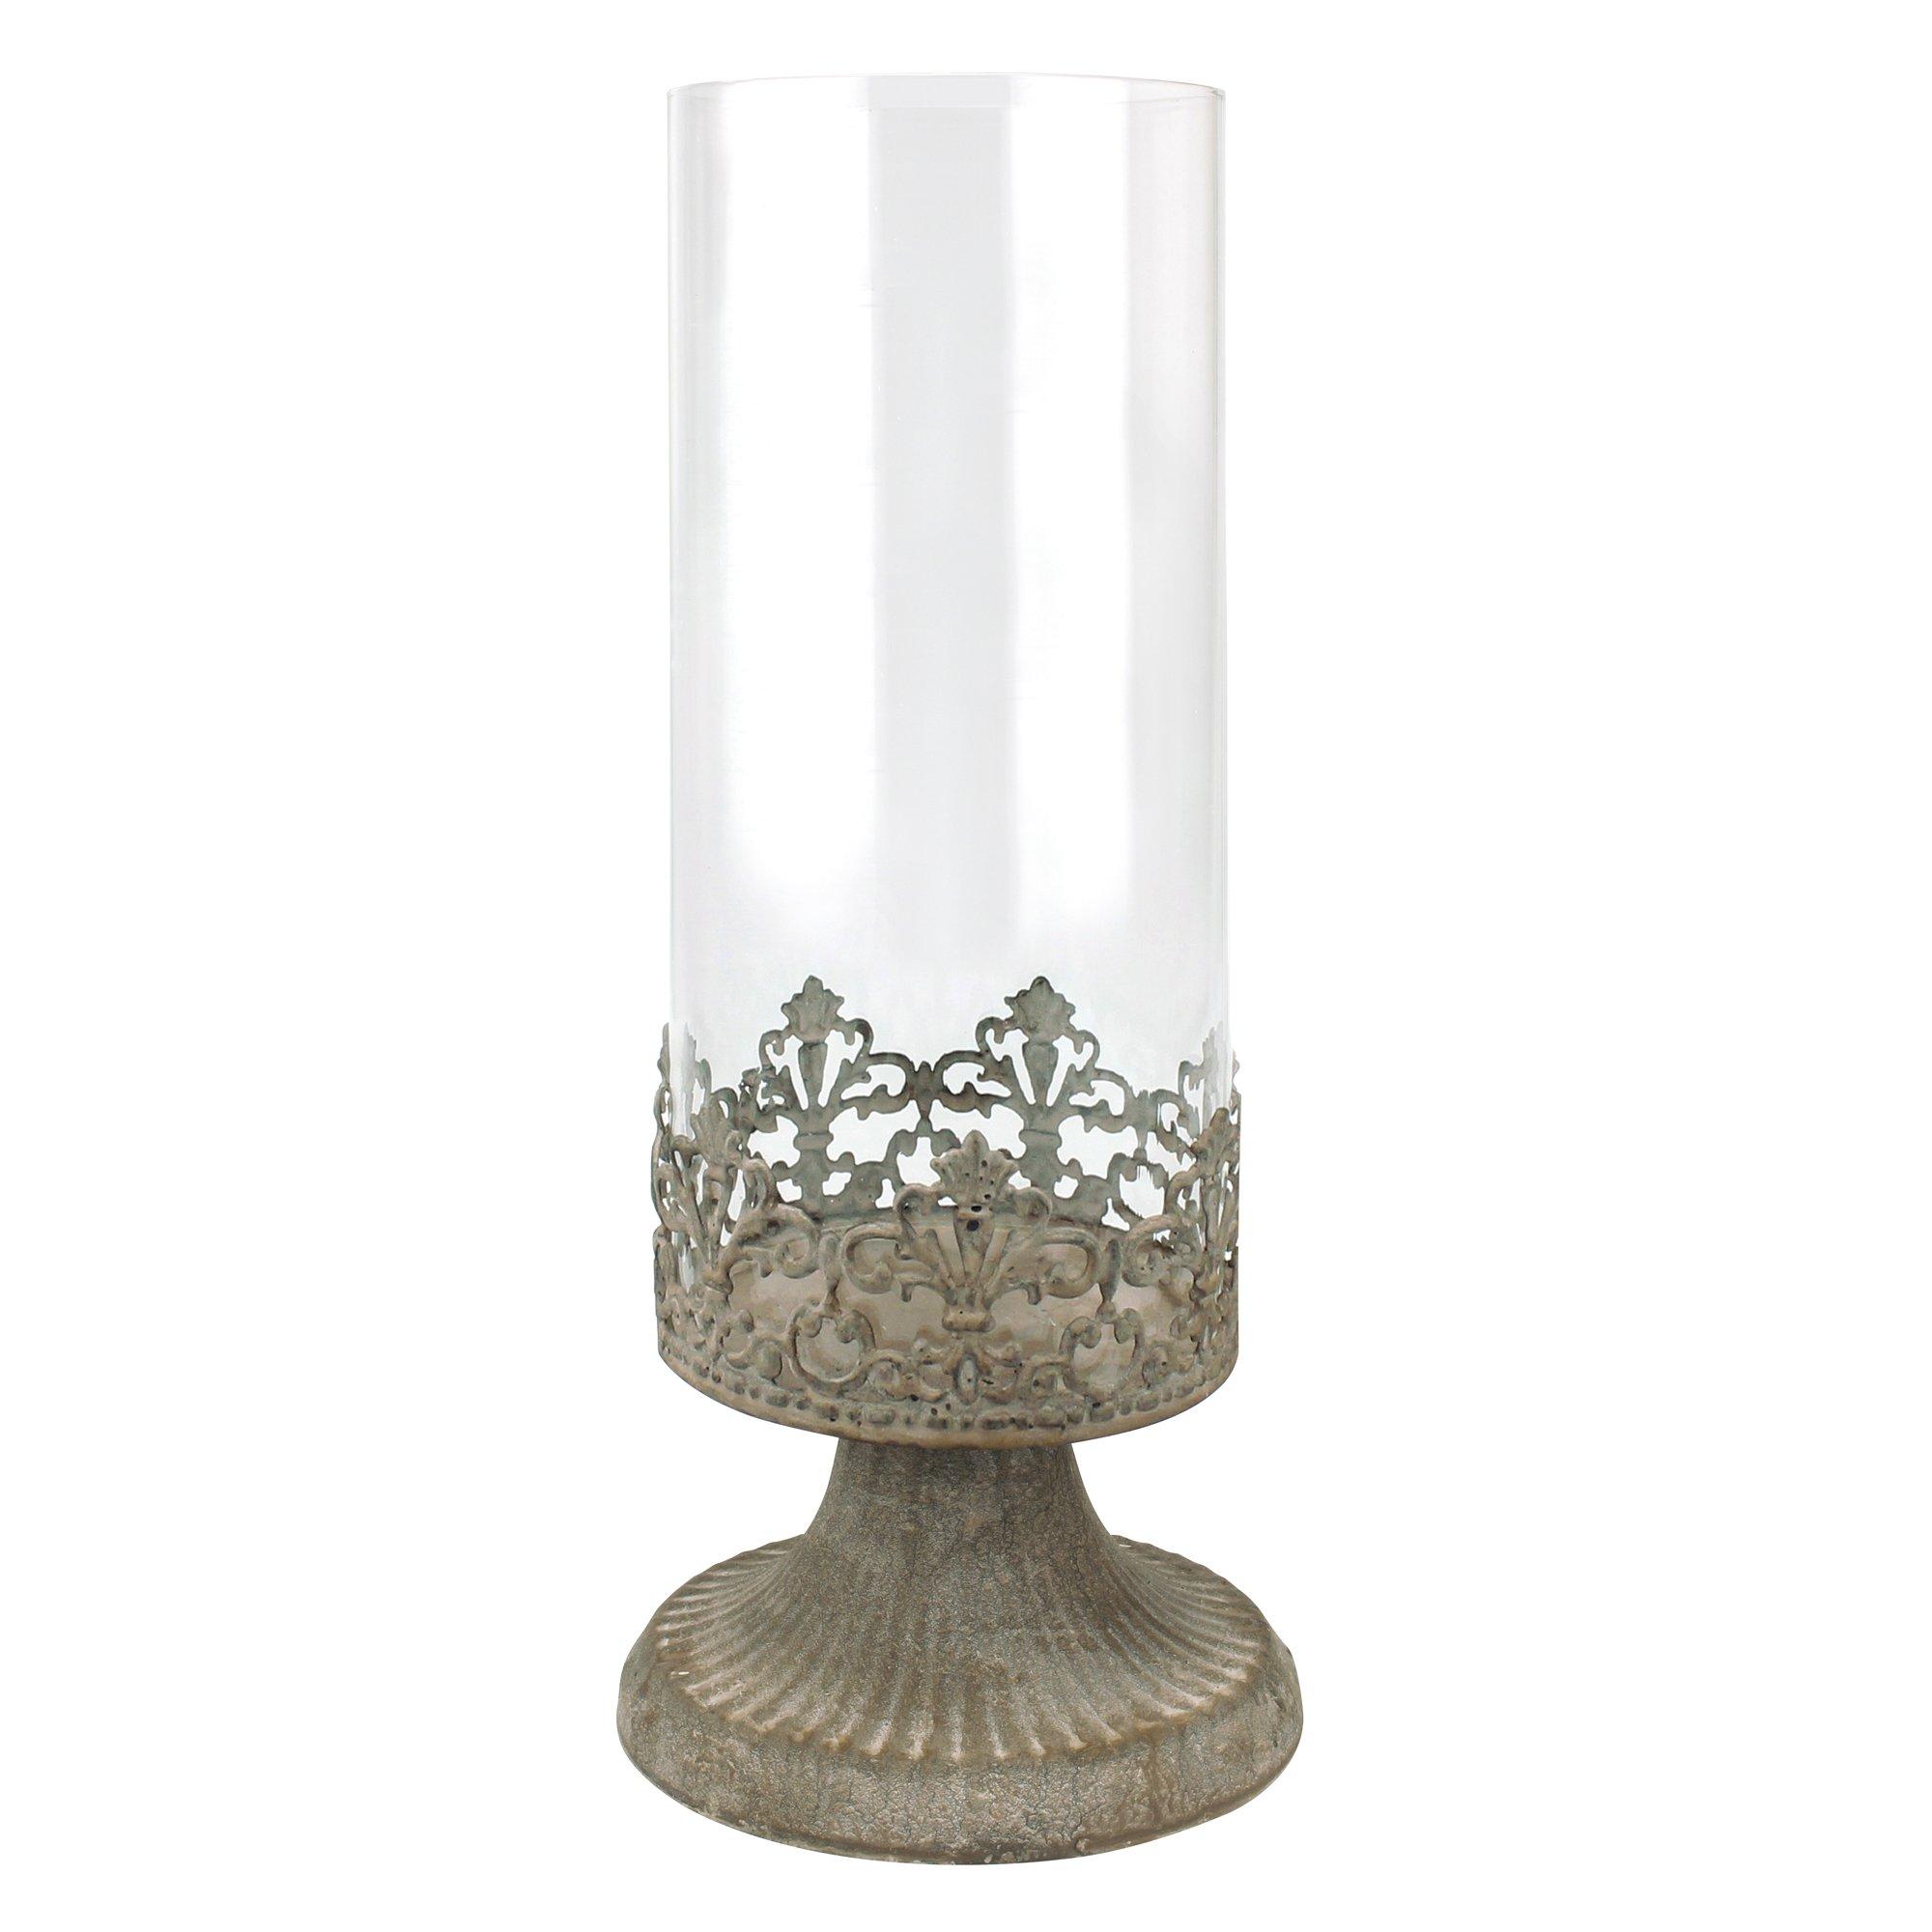 Stonebriar Slim Cylinder Glass Fleur de Lis Hurricane Candle Holder Centerpiece